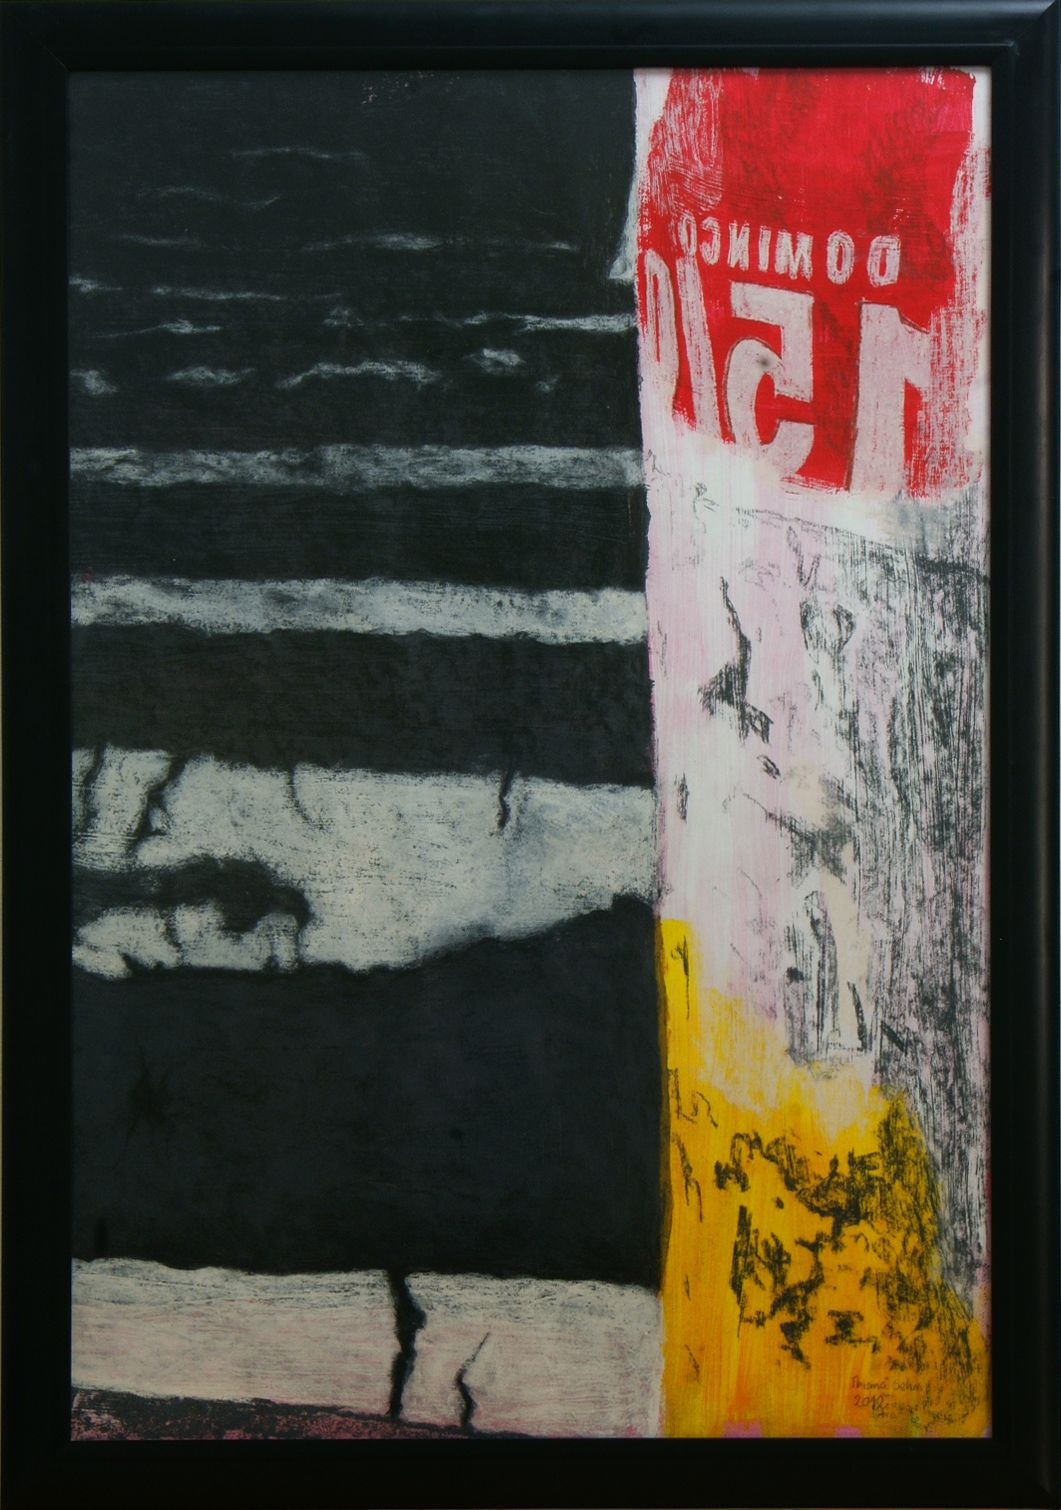 Thiana Sehn - Duque de Caxias, 2012 Pastel seco e guache sobre papel. 70x100cm.